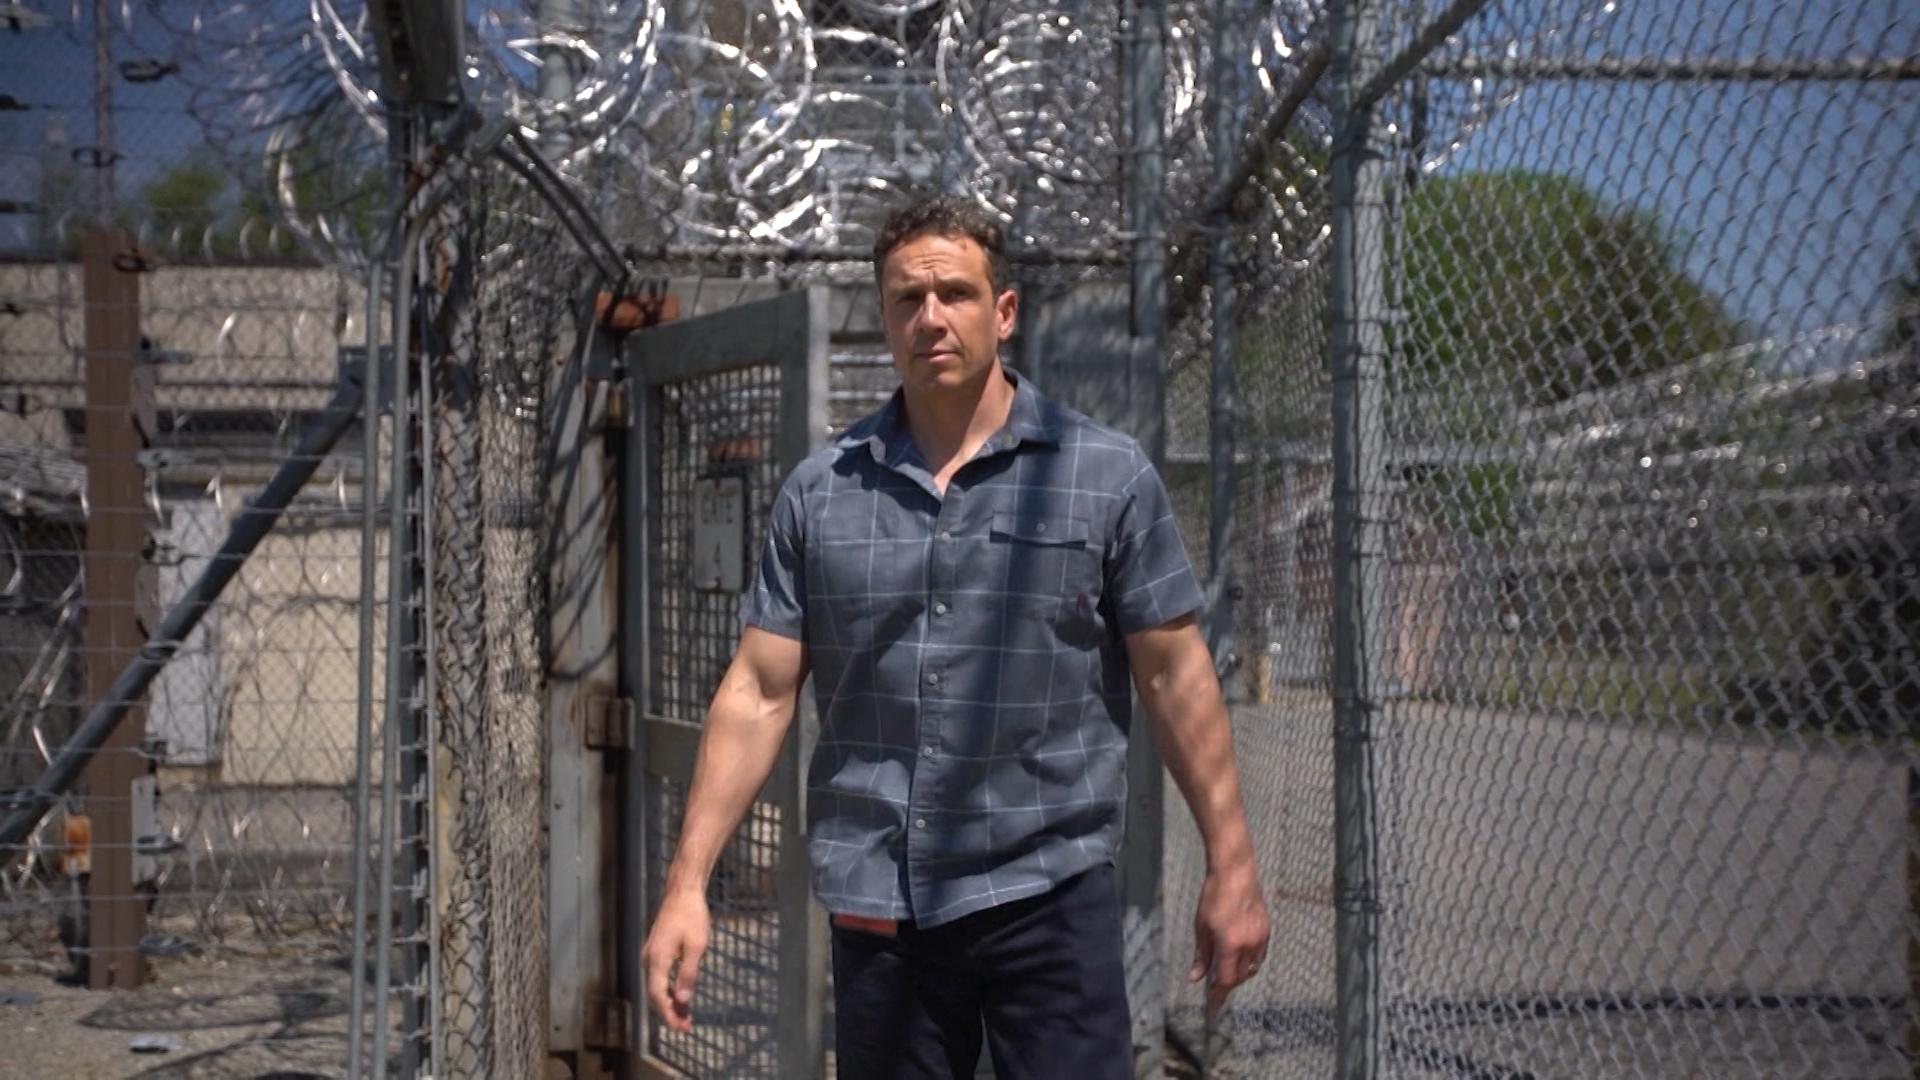 CNN Anchor Chris Cuomo Leads New HLN Investigative Series